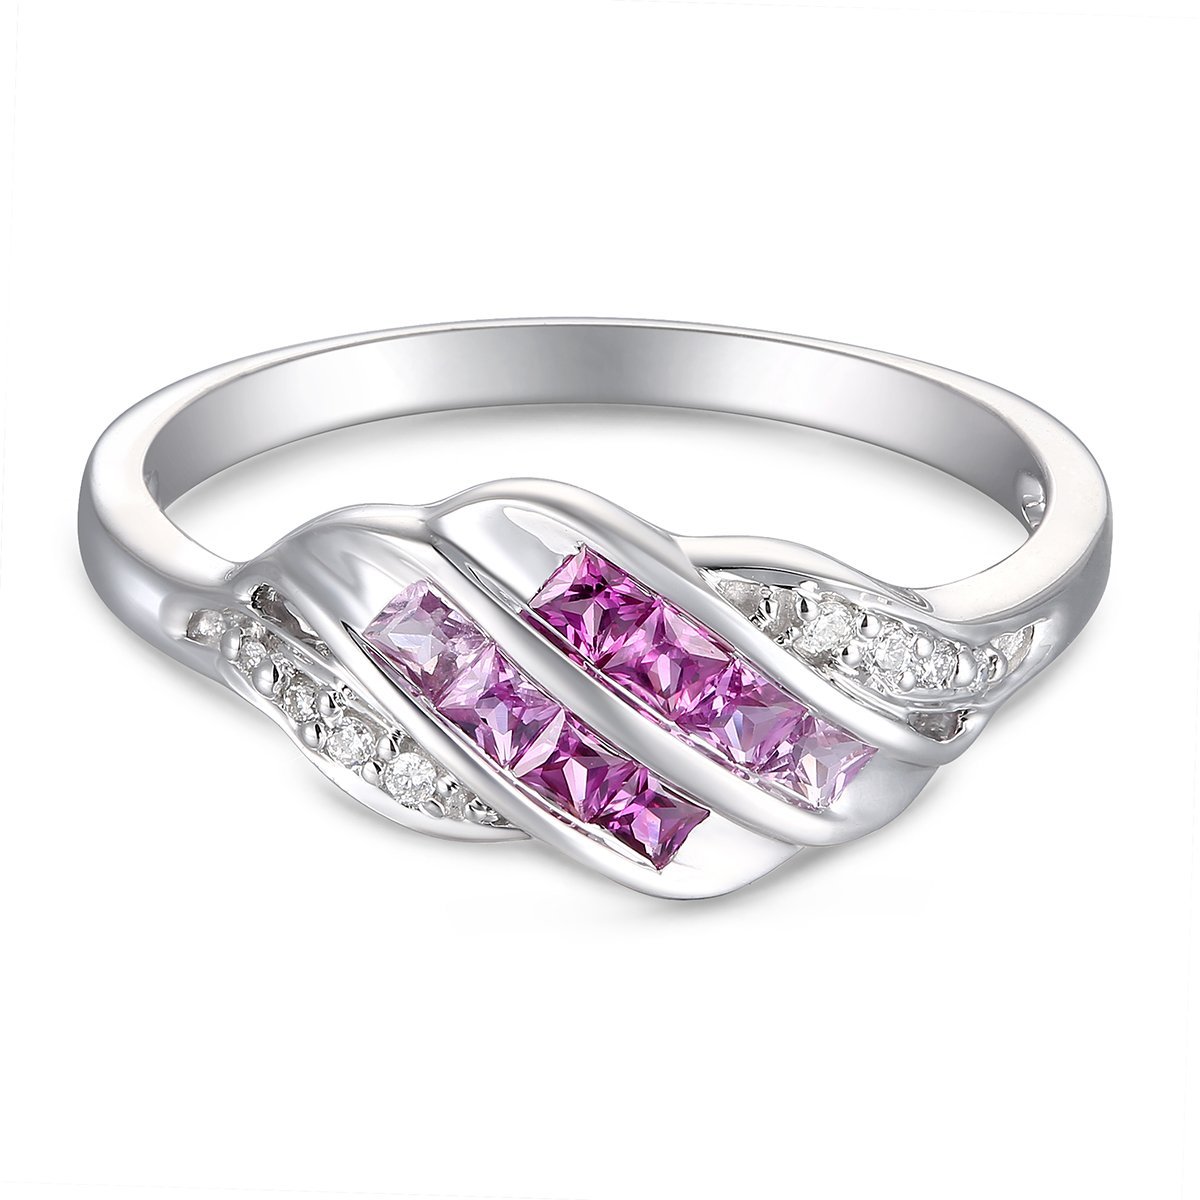 Ferhe New York 14K Gold, Diamond & Pink Sapphire & Ruby Ring,Diamond Ring,Pink Sapphire & Ruby Ring